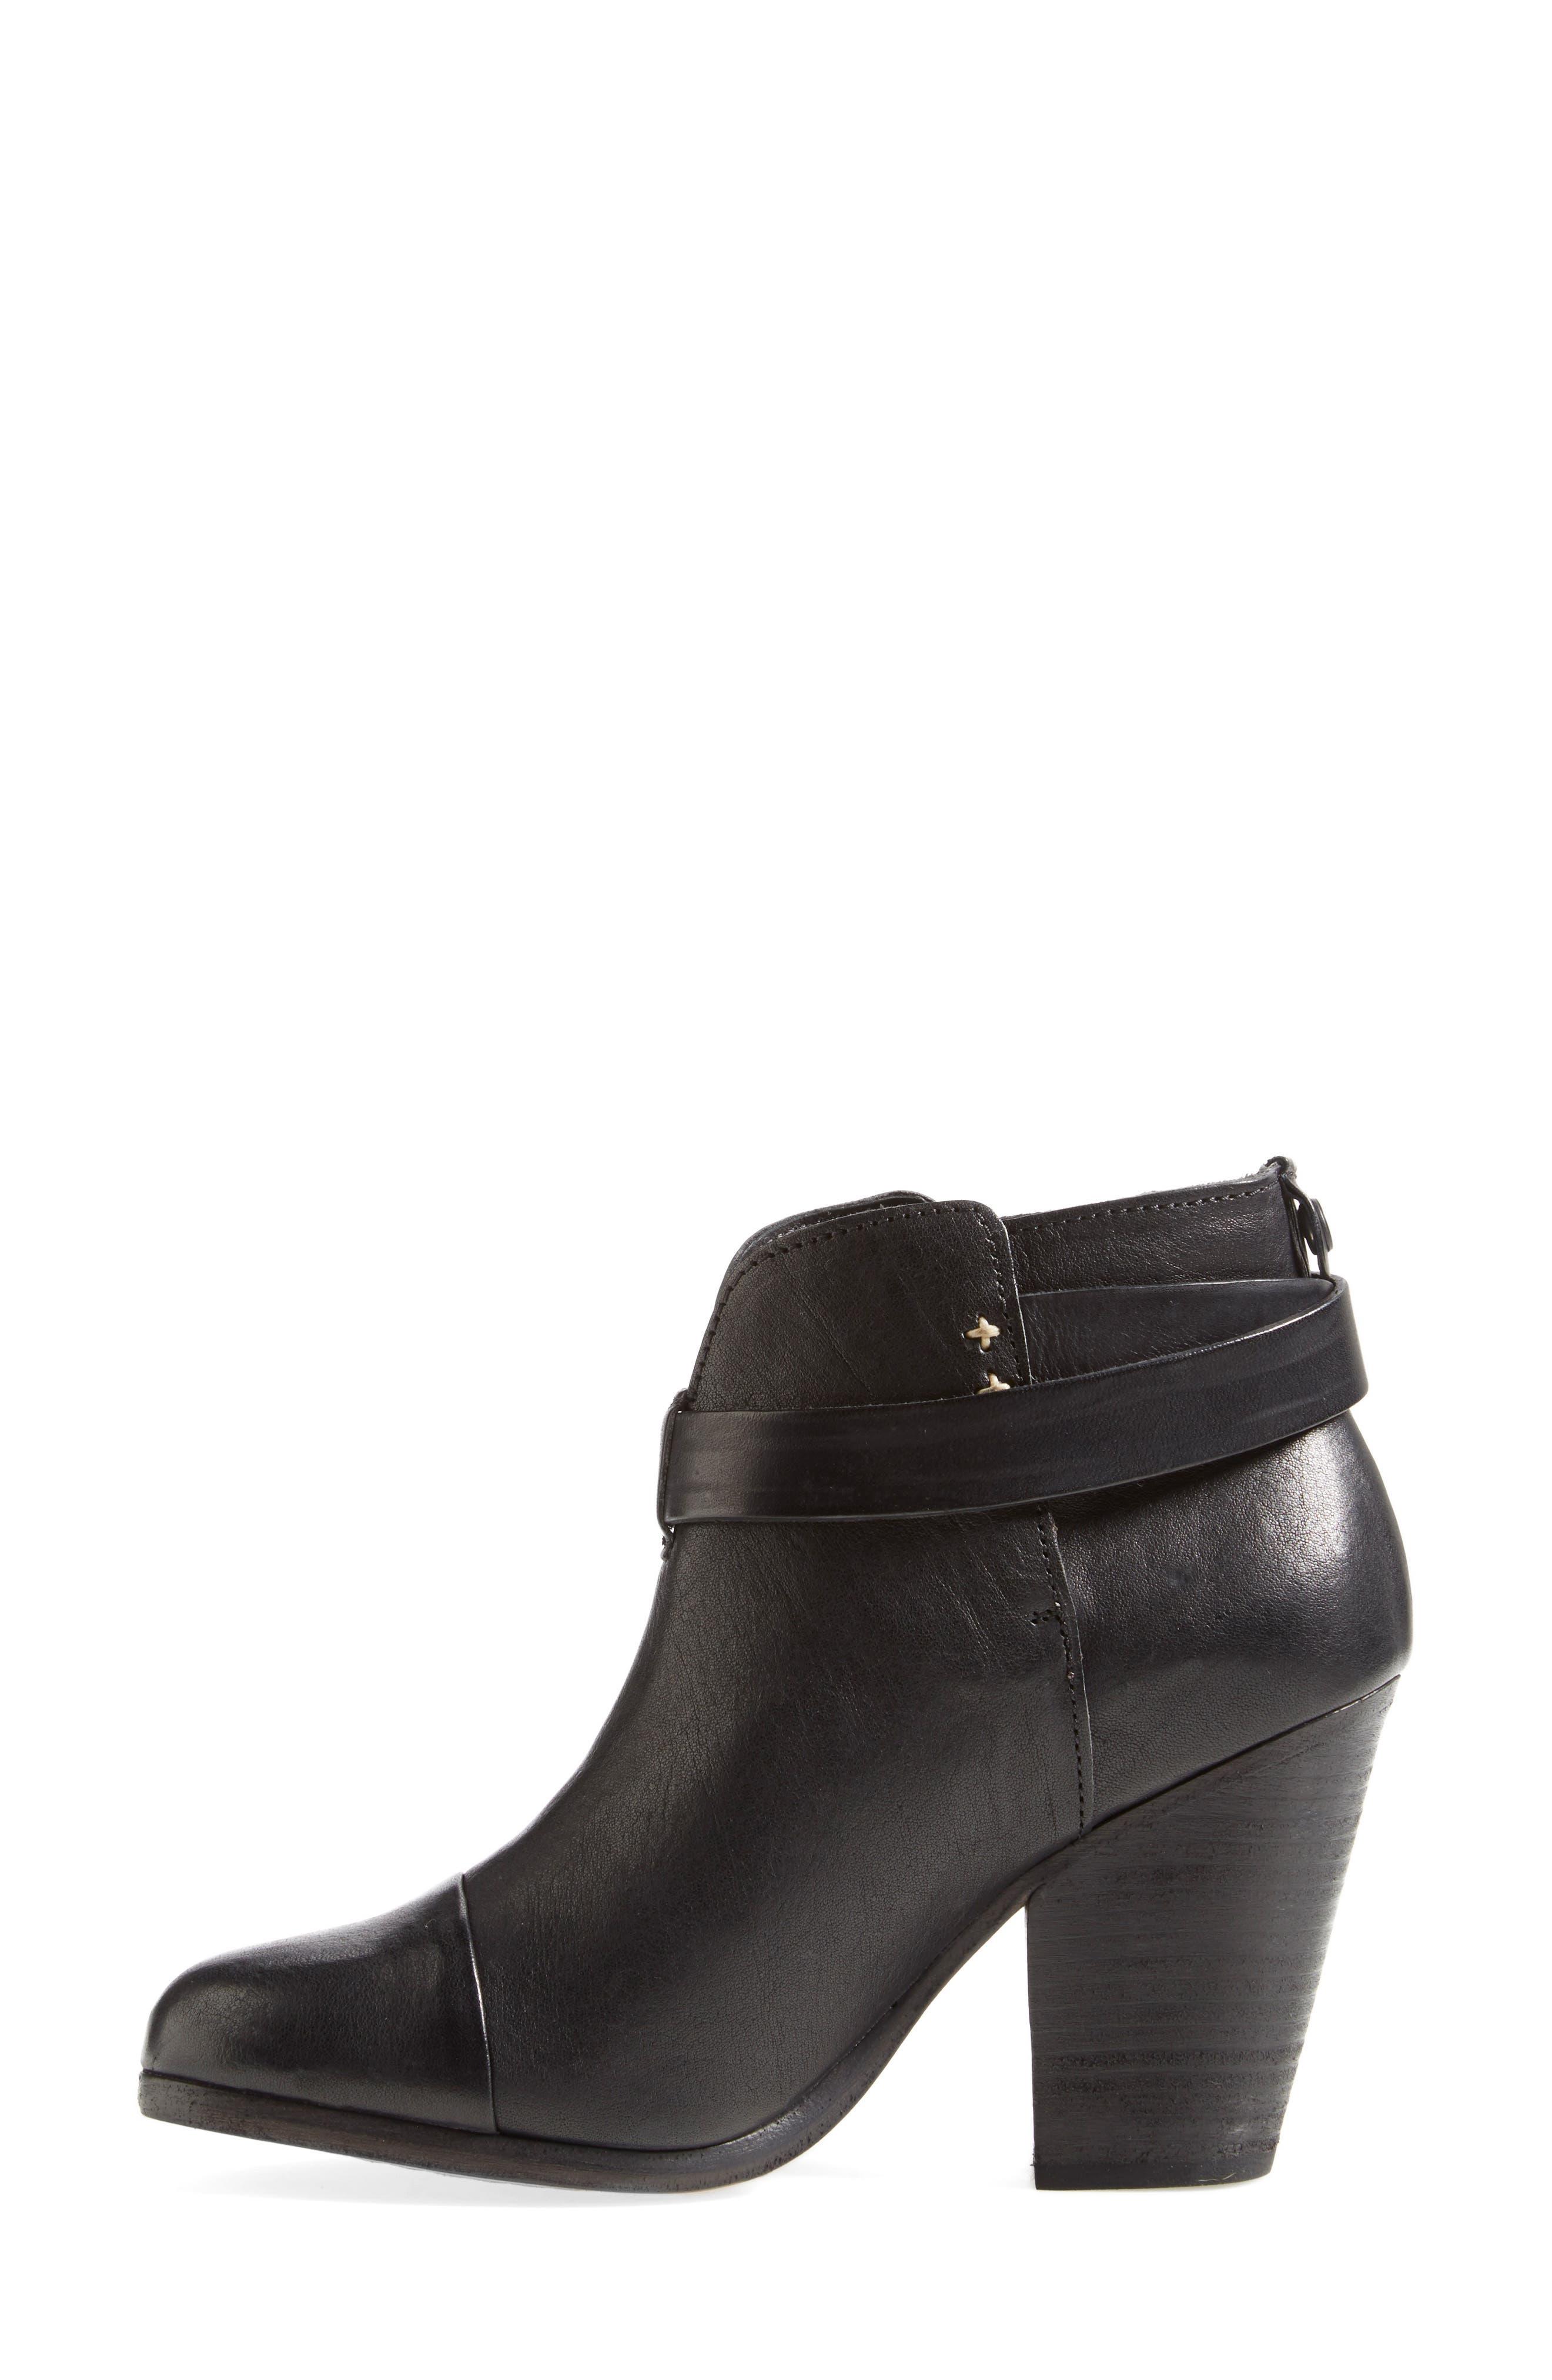 'Harrow' Leather Boot,                             Alternate thumbnail 2, color,                             BLACK